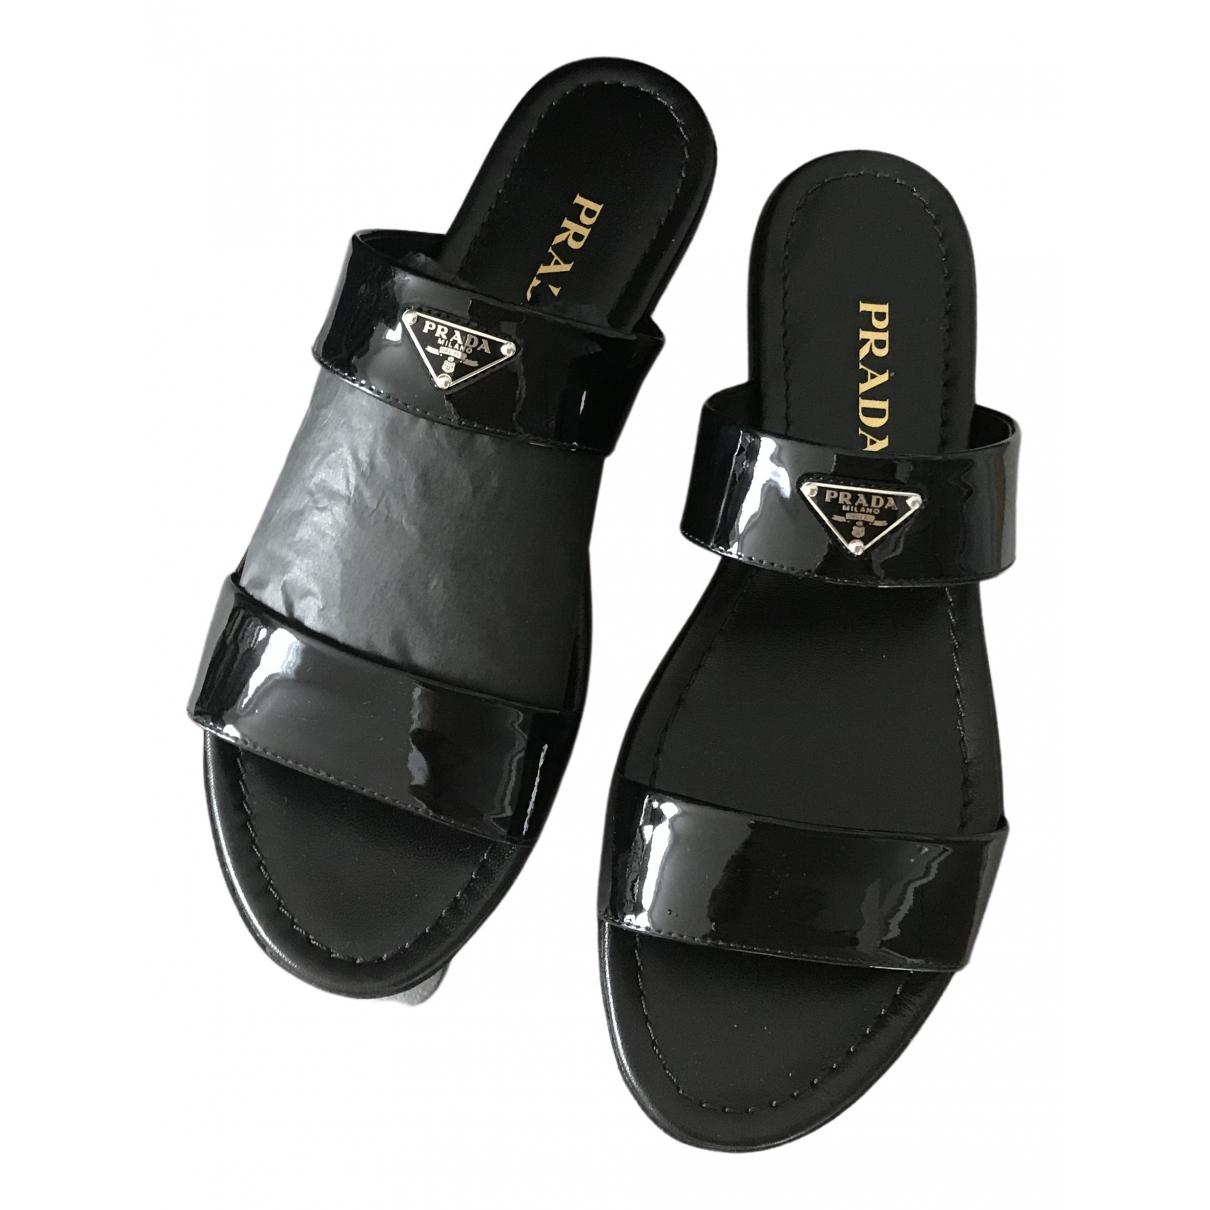 Prada \N Black Patent leather Sandals for Women 38.5 EU